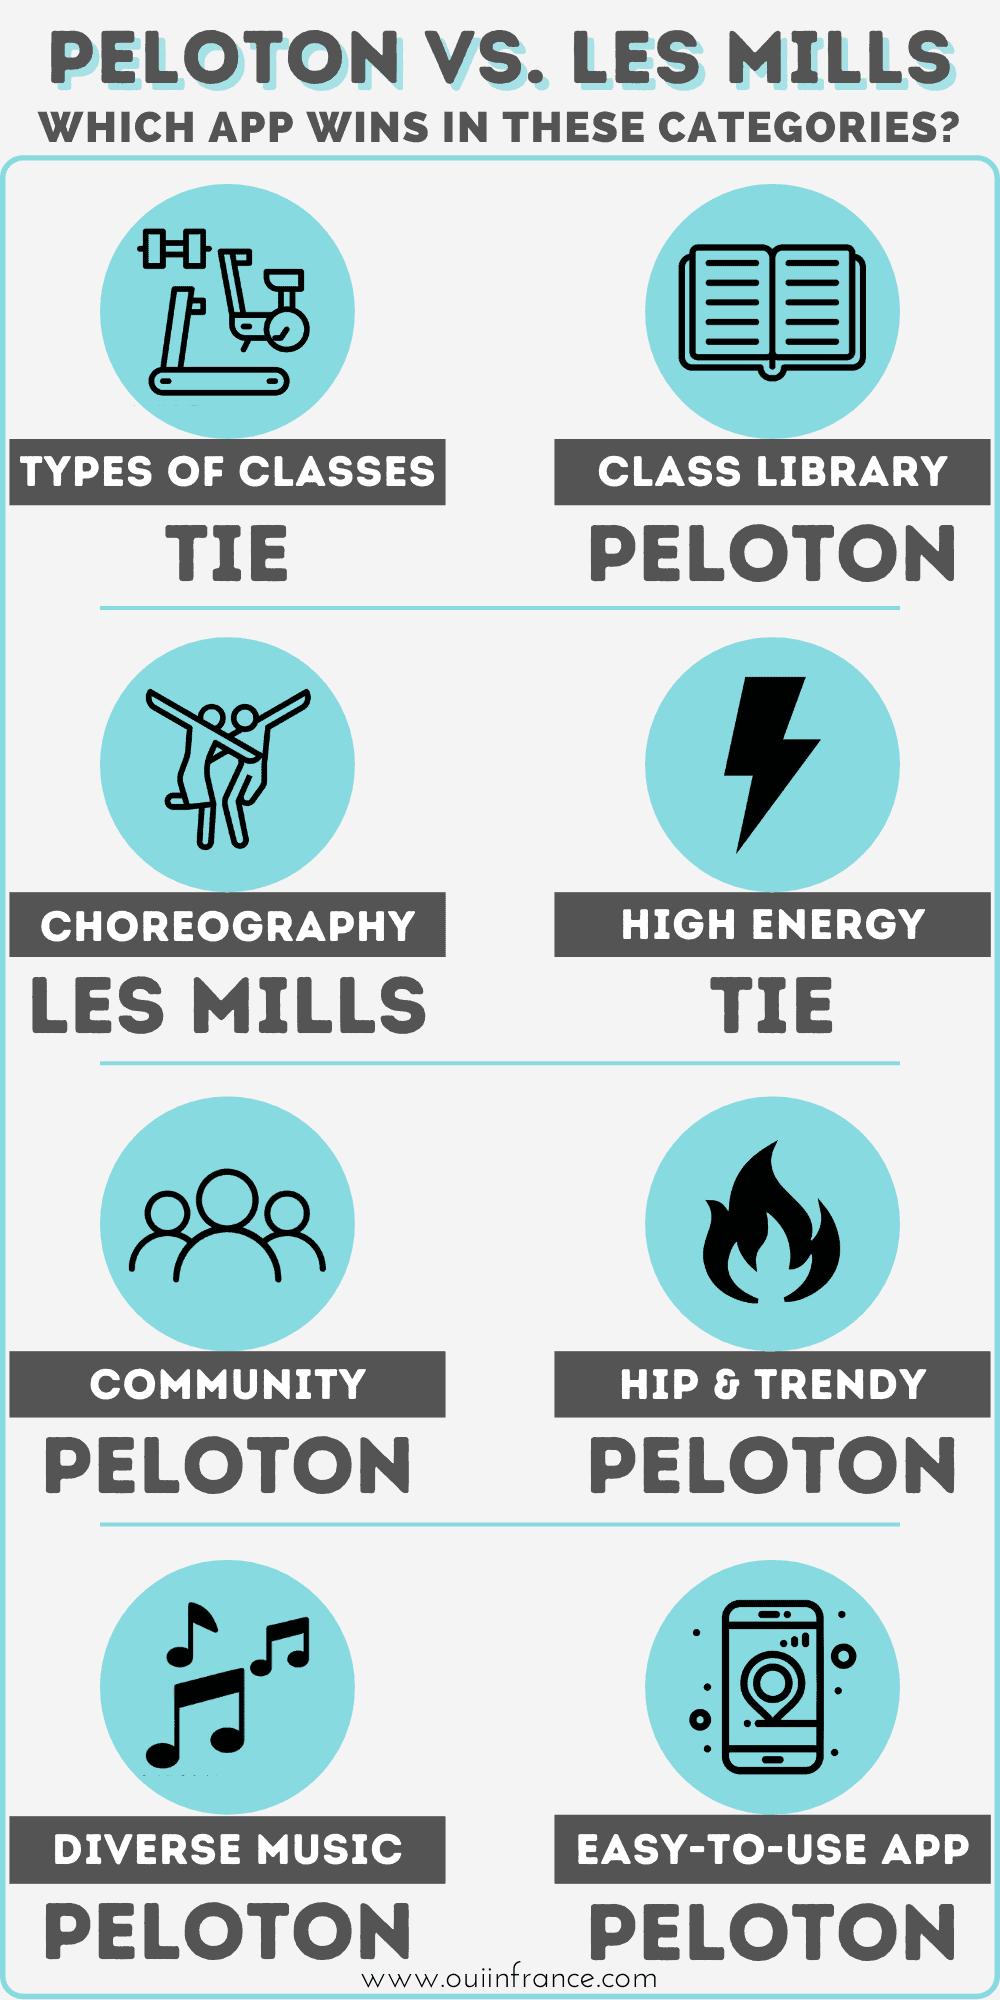 Peloton vs. Les Mills app graphic (1)